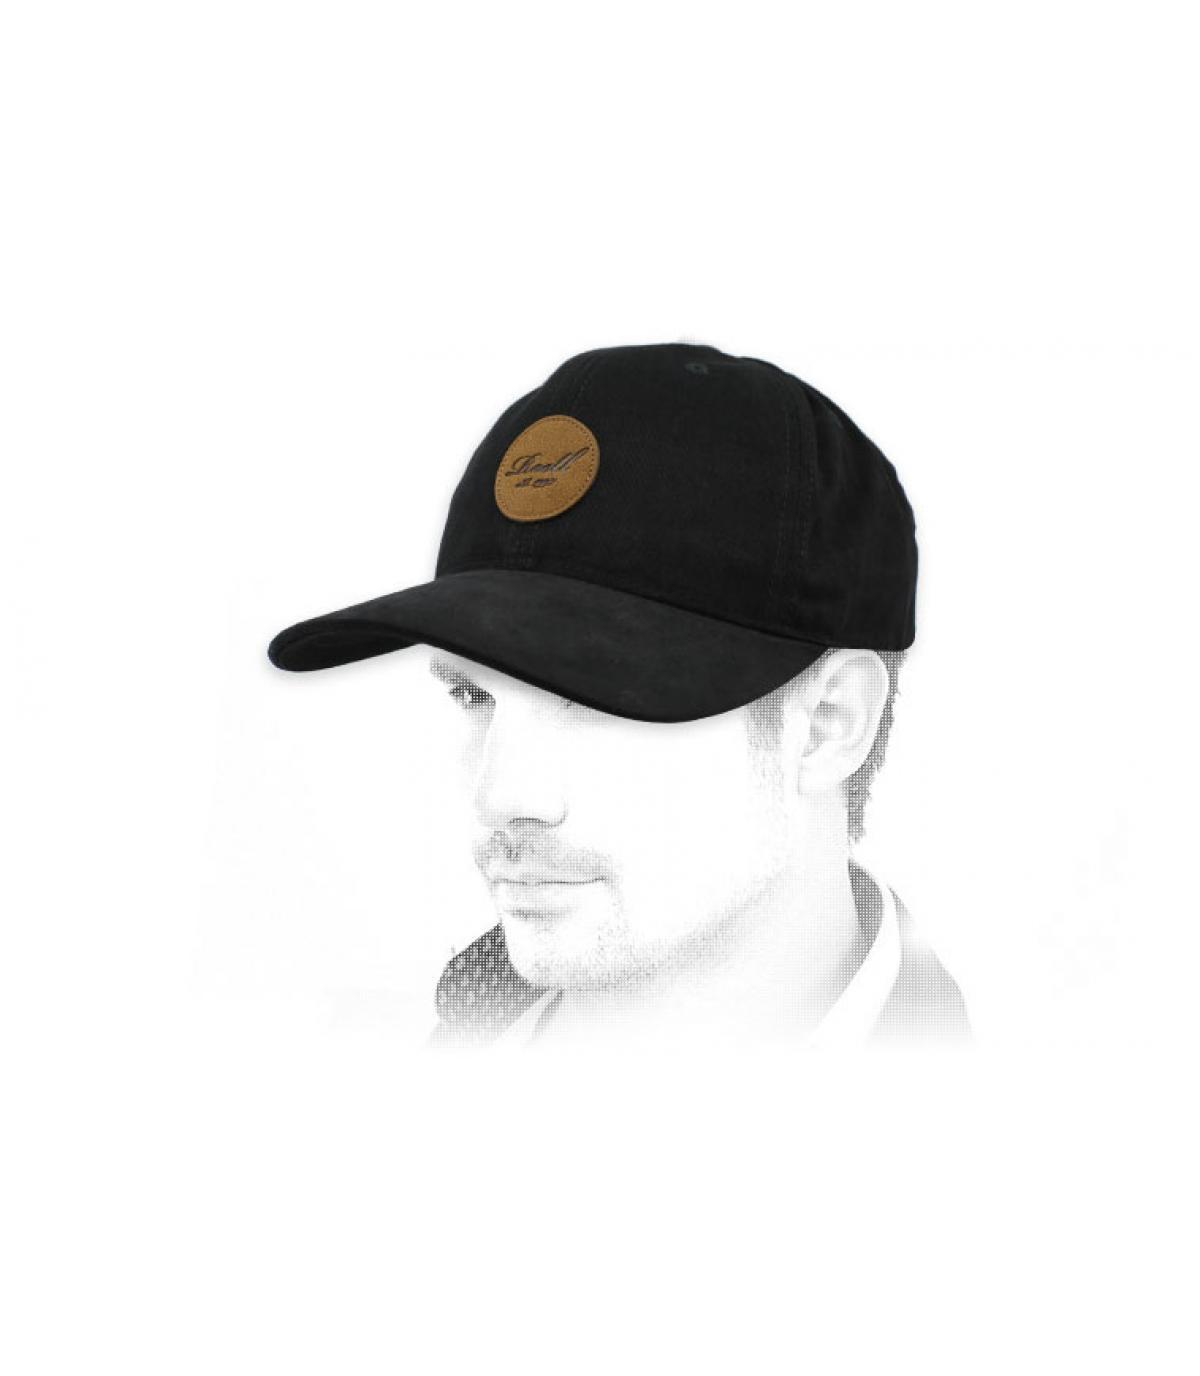 Reell black cap